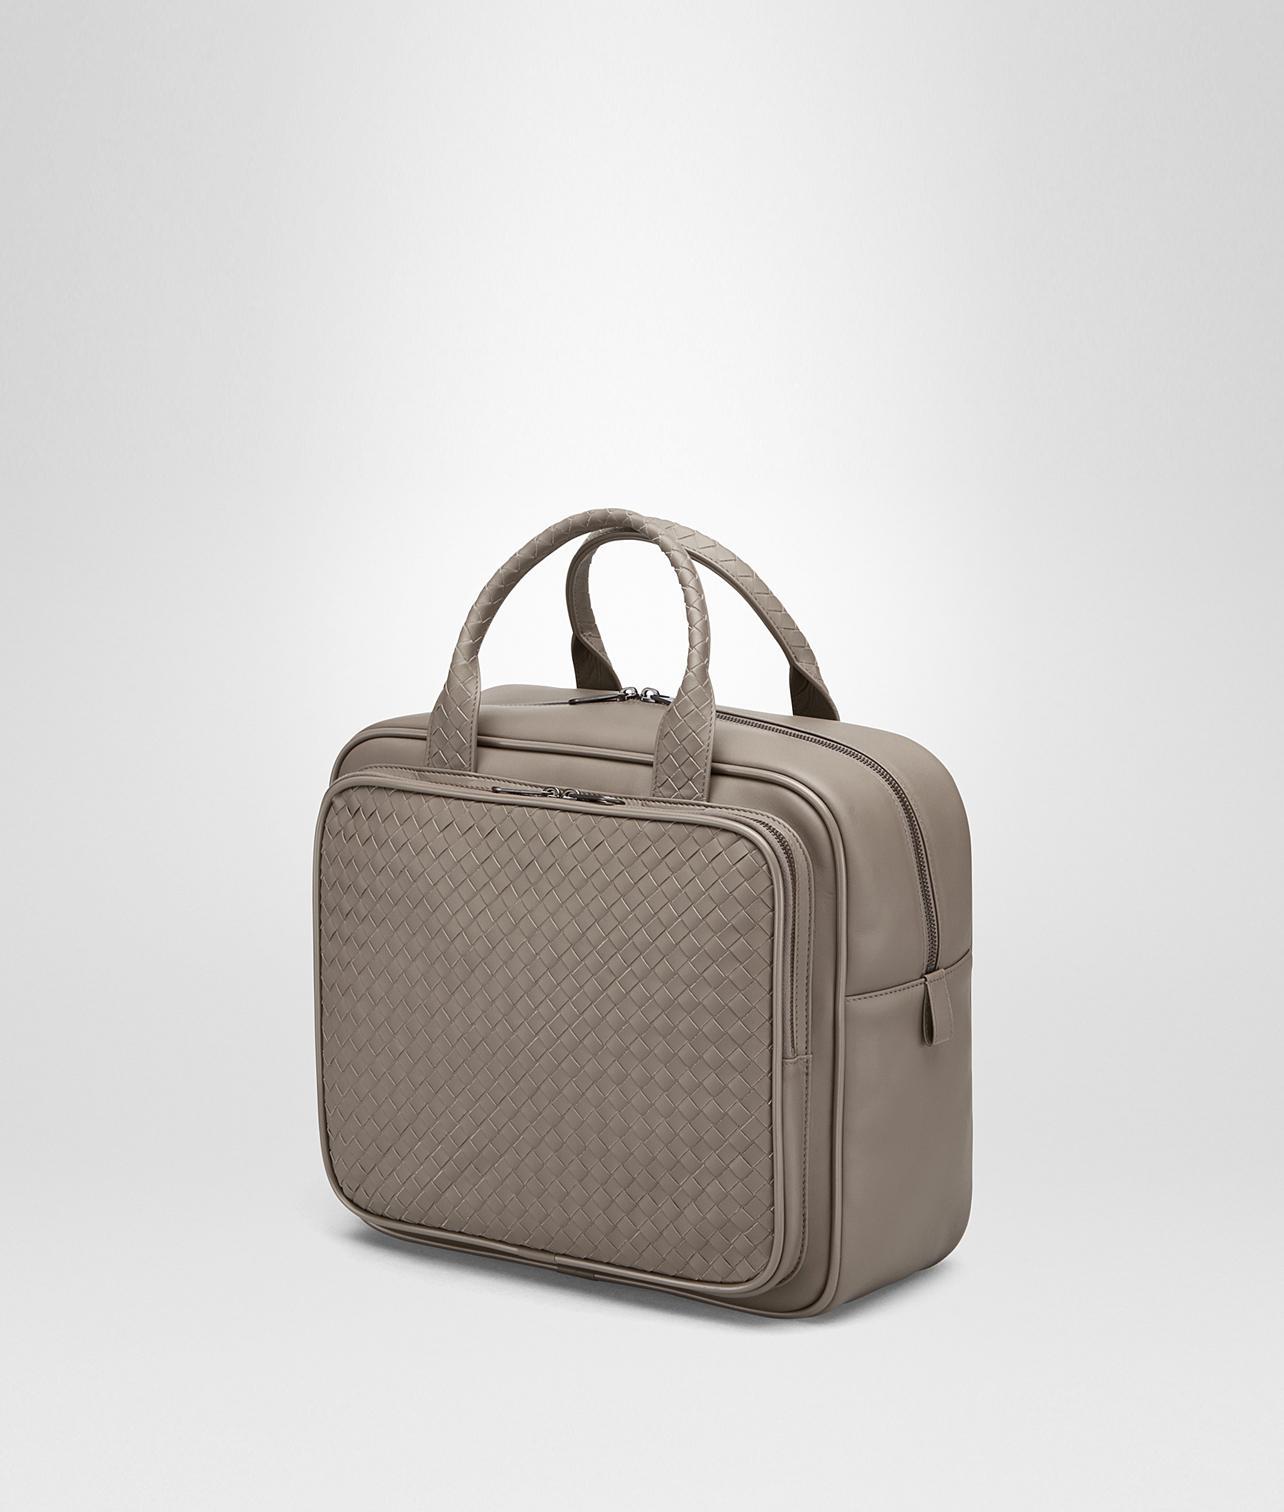 d4ca5313ffbf Lyst - Bottega Veneta Steel Intrecciato Briefcase in Gray